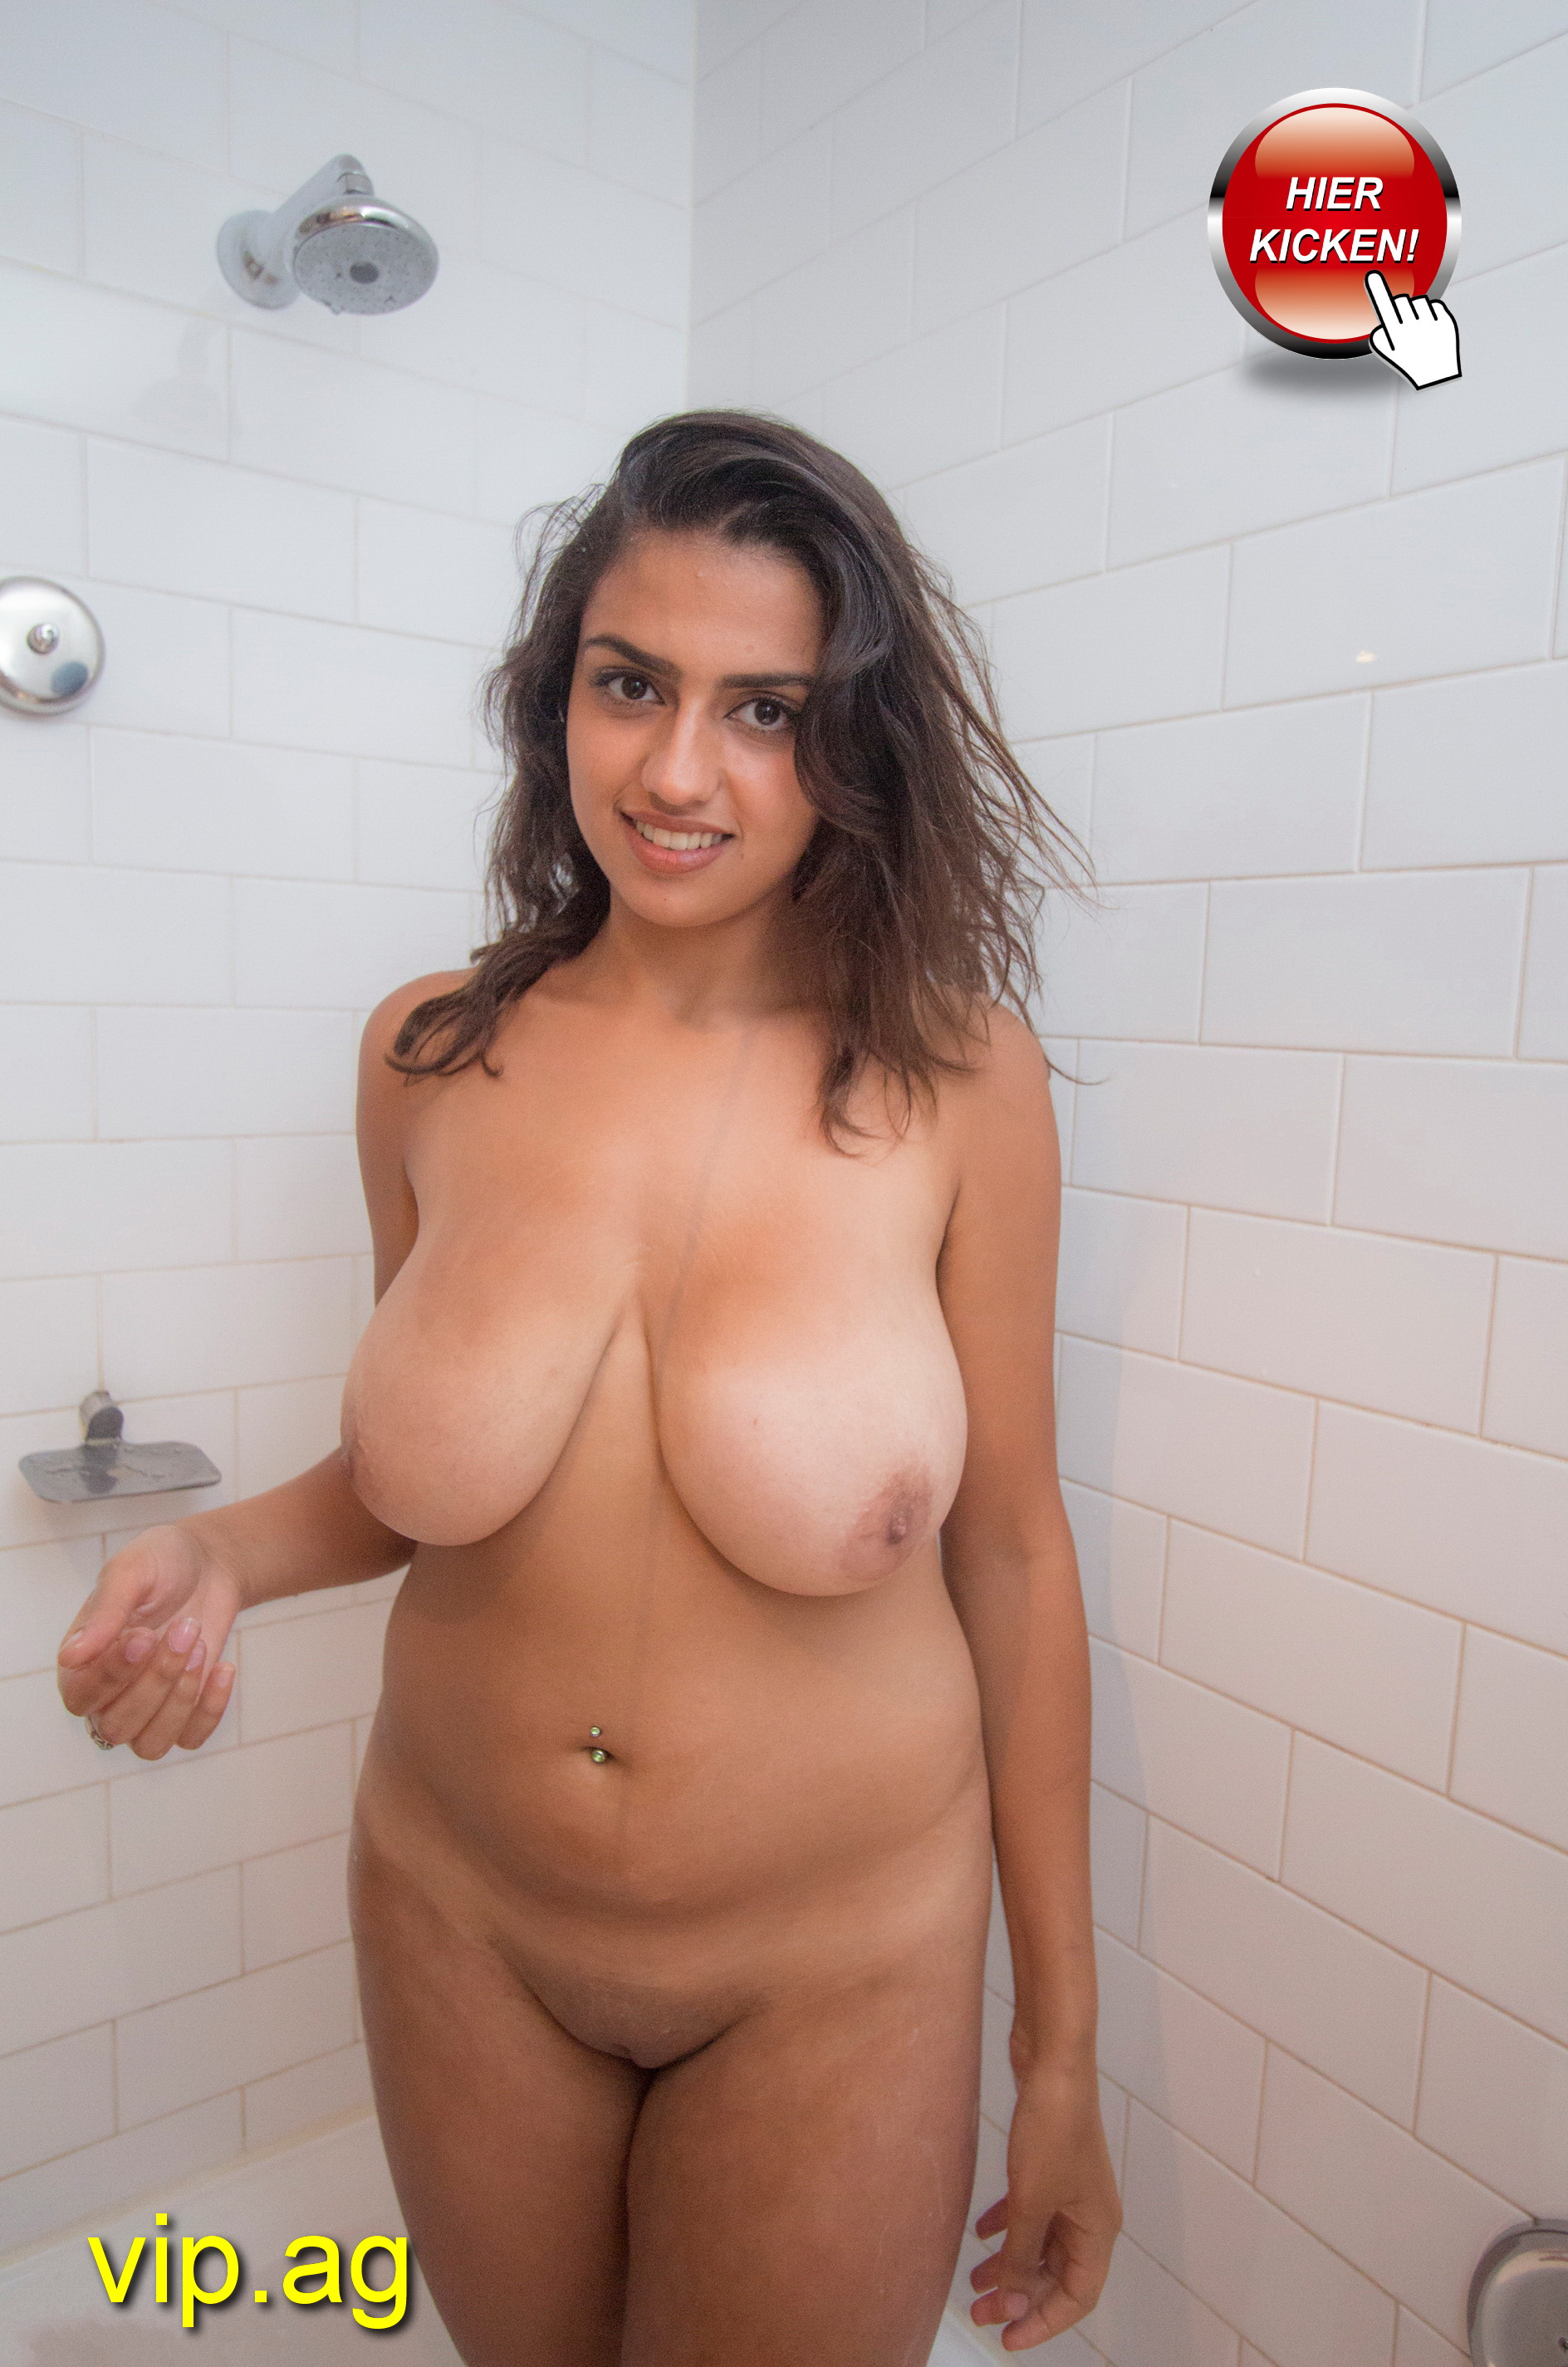 monströse Brüste Simone